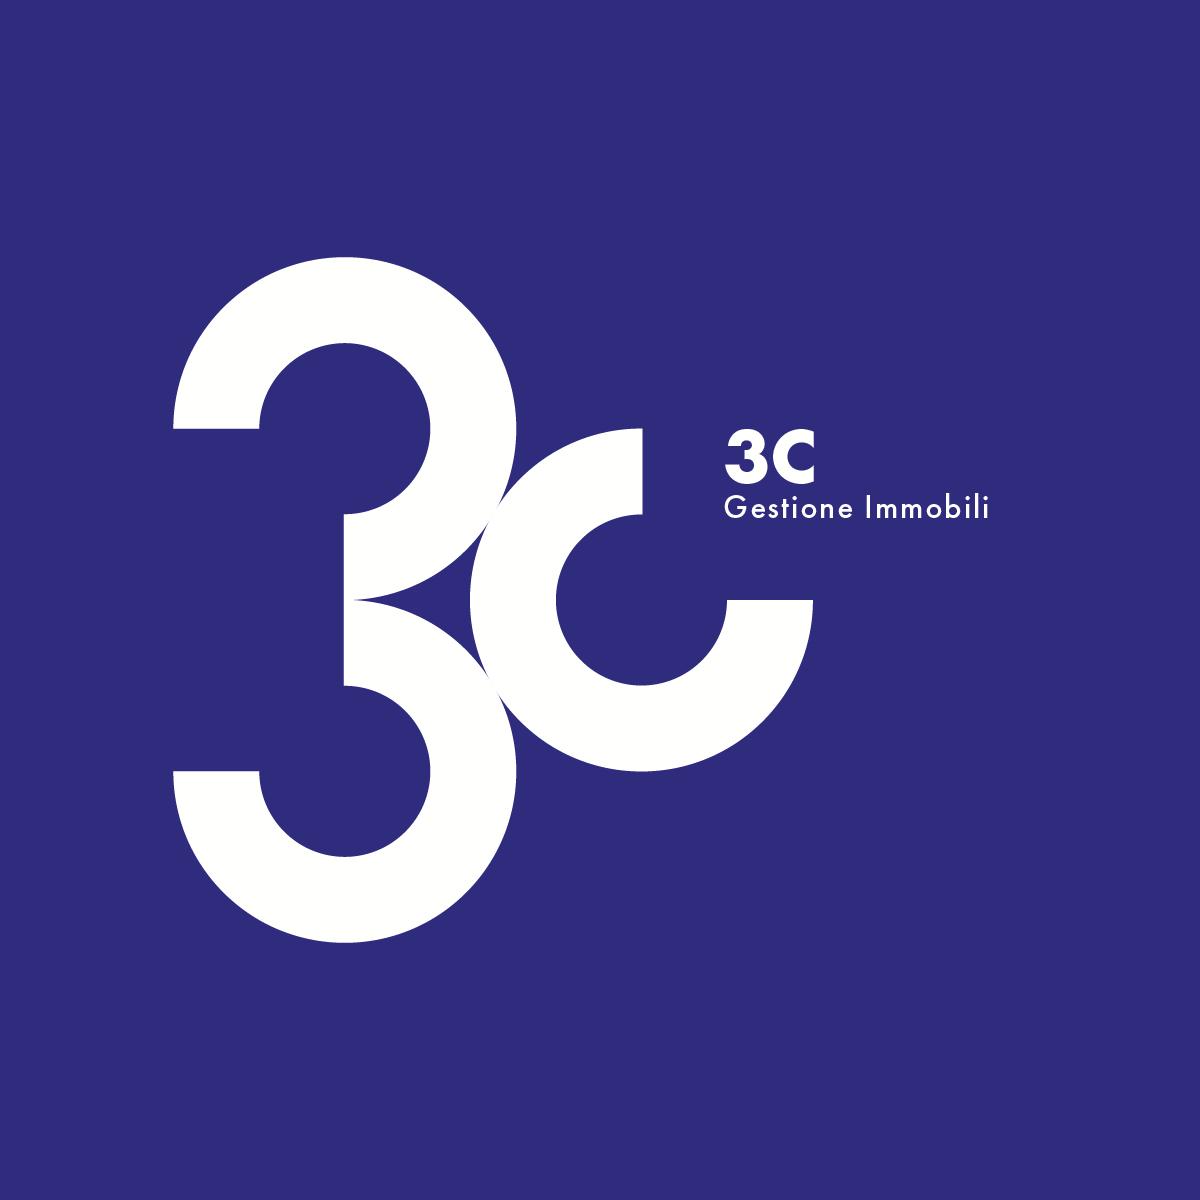 3C-Gestione-Immobili-002